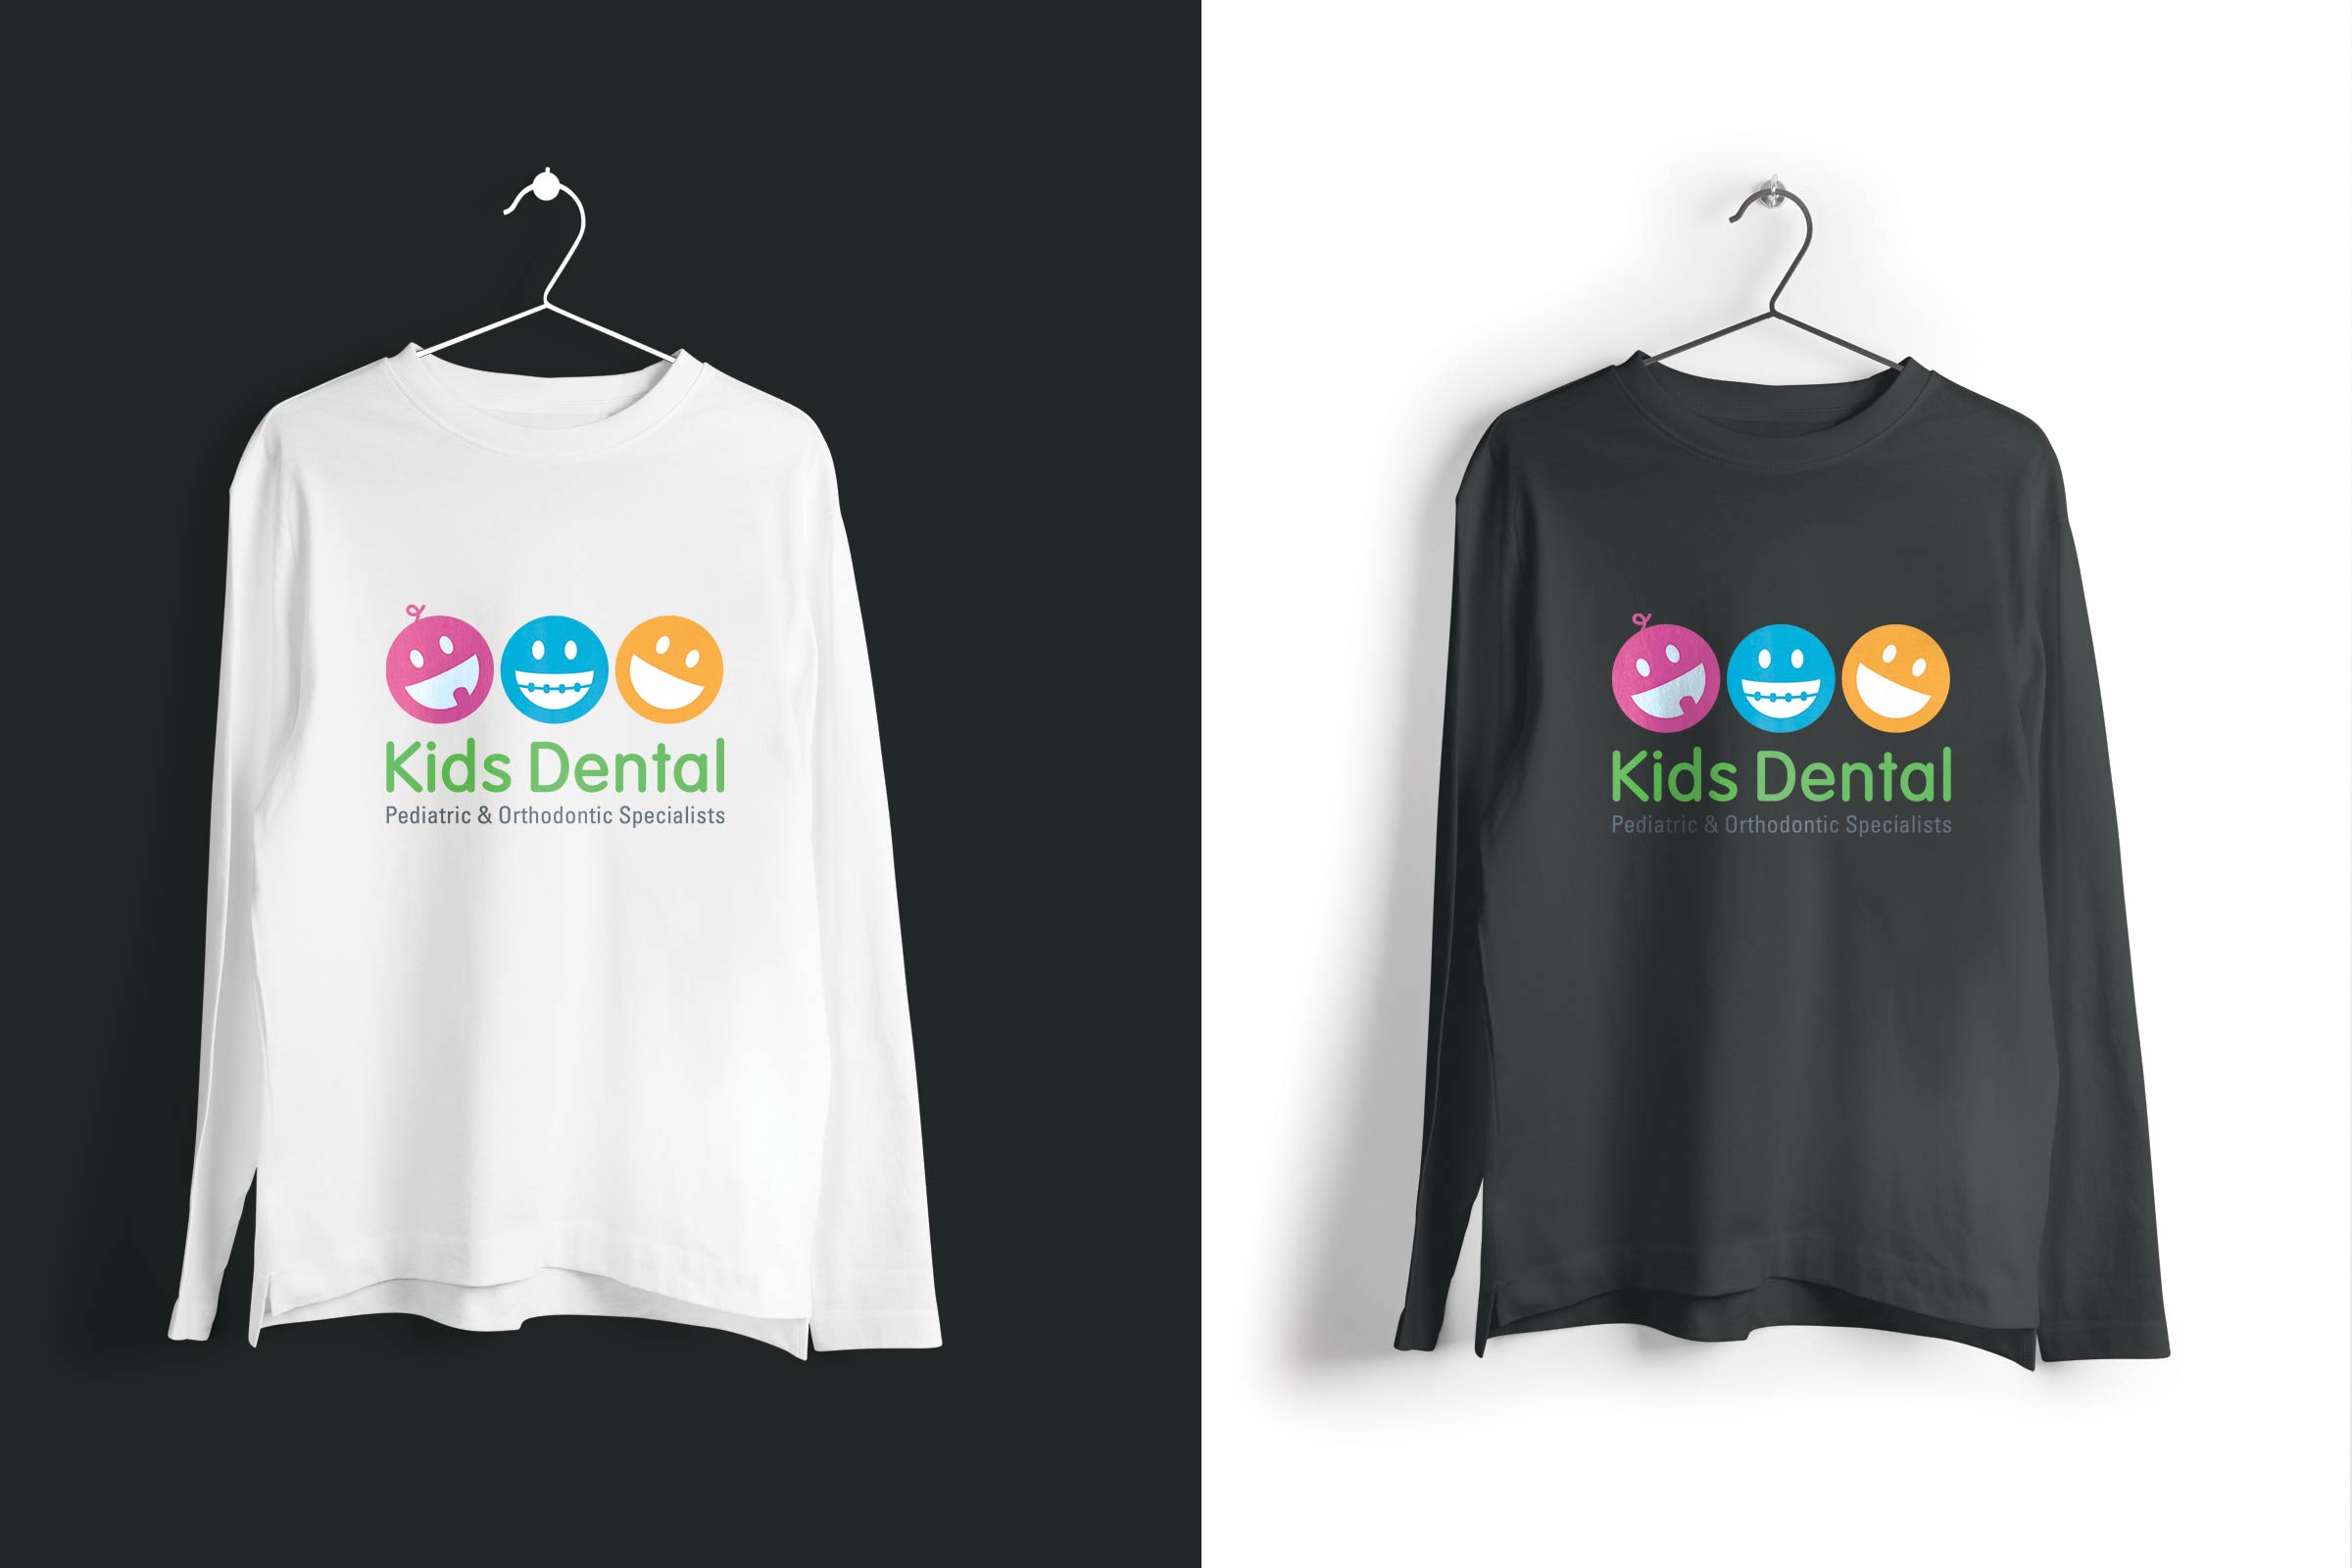 KidsDental